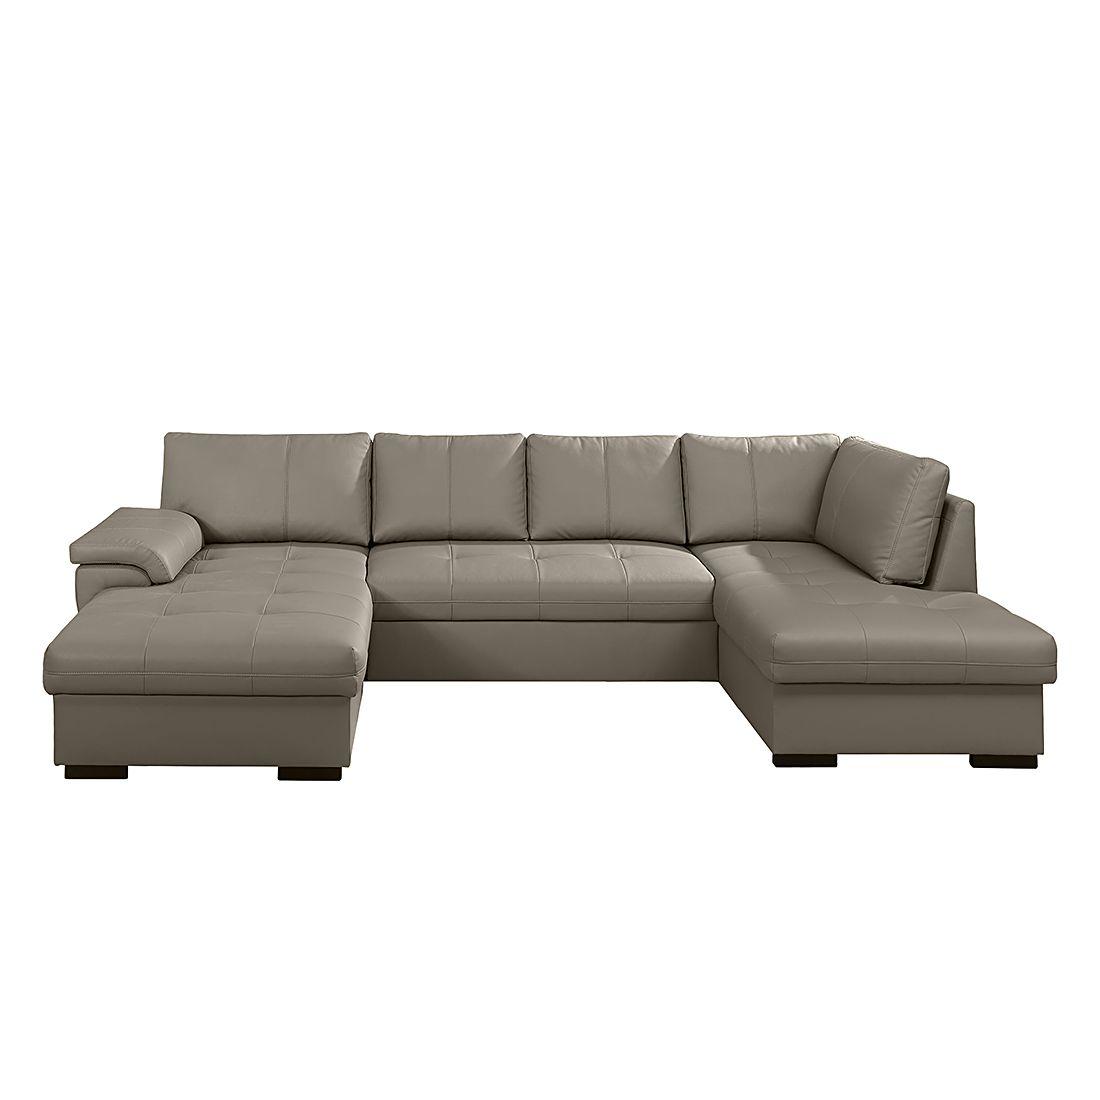 wohnlandschaft cuenca mit schlaffunktion kunstleder taupe ottomane davorstehend rechts. Black Bedroom Furniture Sets. Home Design Ideas